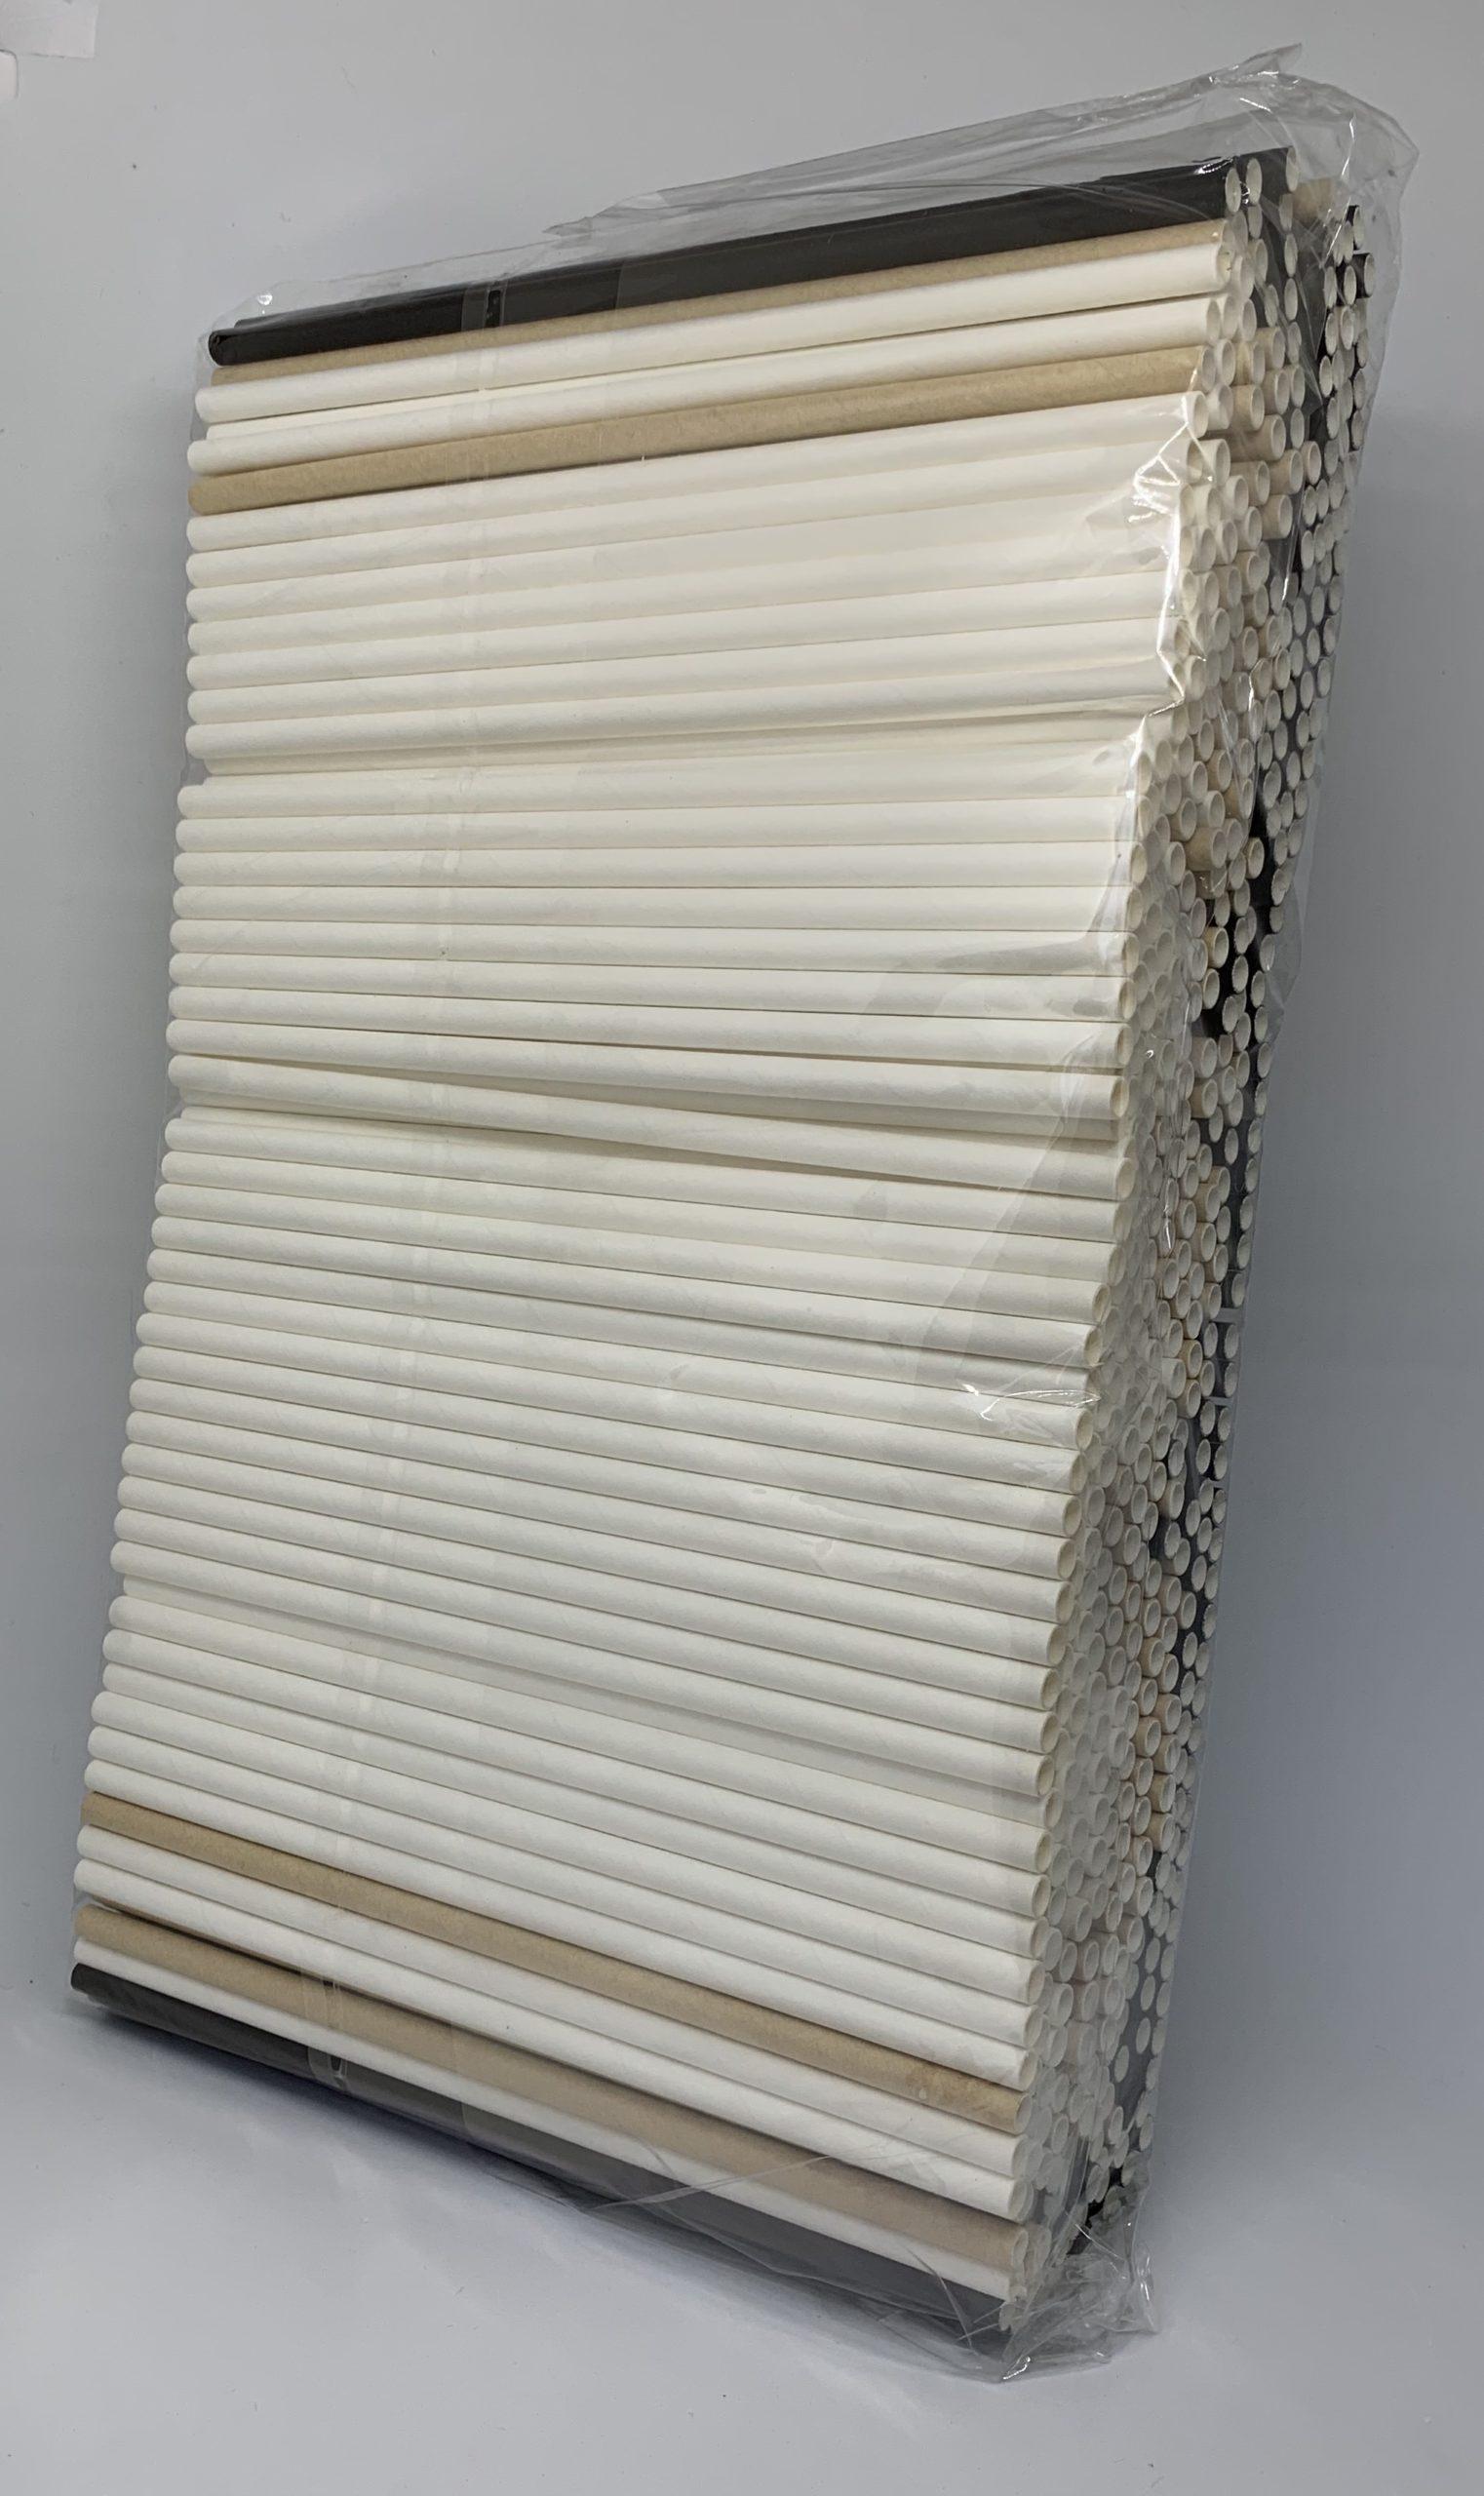 Kraft, wit, zwart mix papieren rietjes, 6 mm doorsnede en 20 cm lang zak